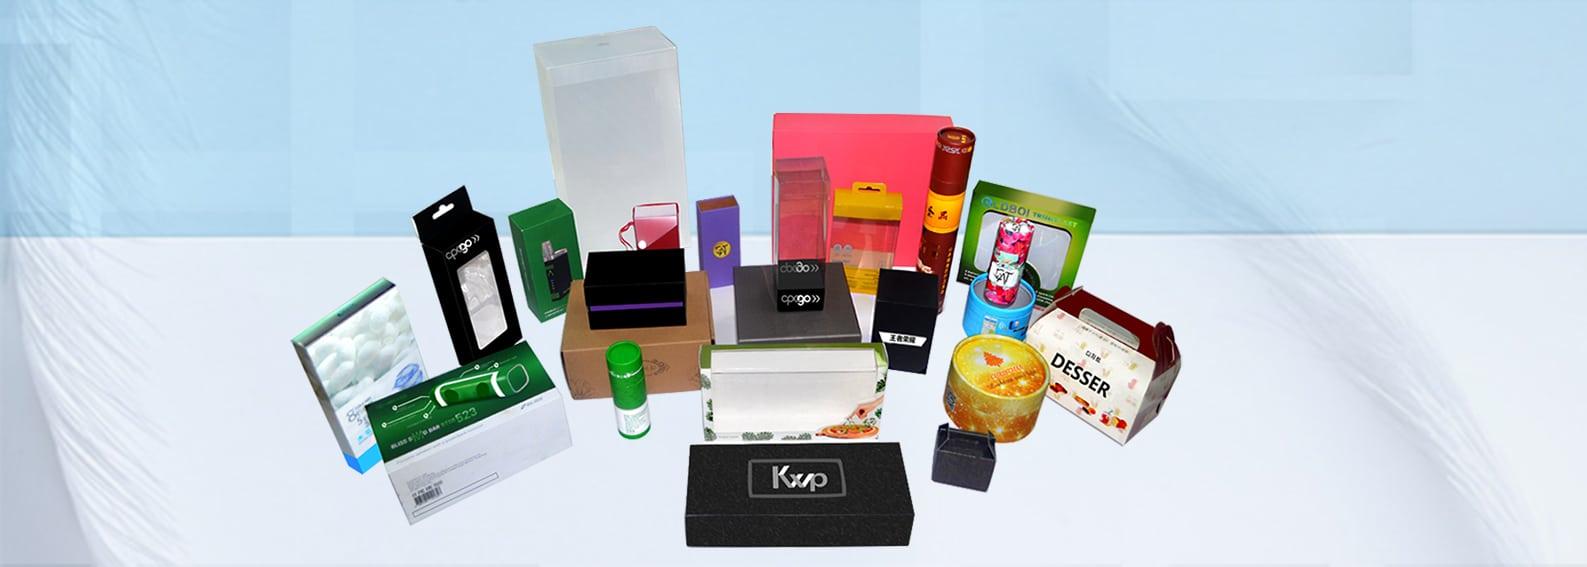 Perfume Boxes Wholesale,Perfume Boxes,wholesale Perfume Boxes,Best Perfume Boxes